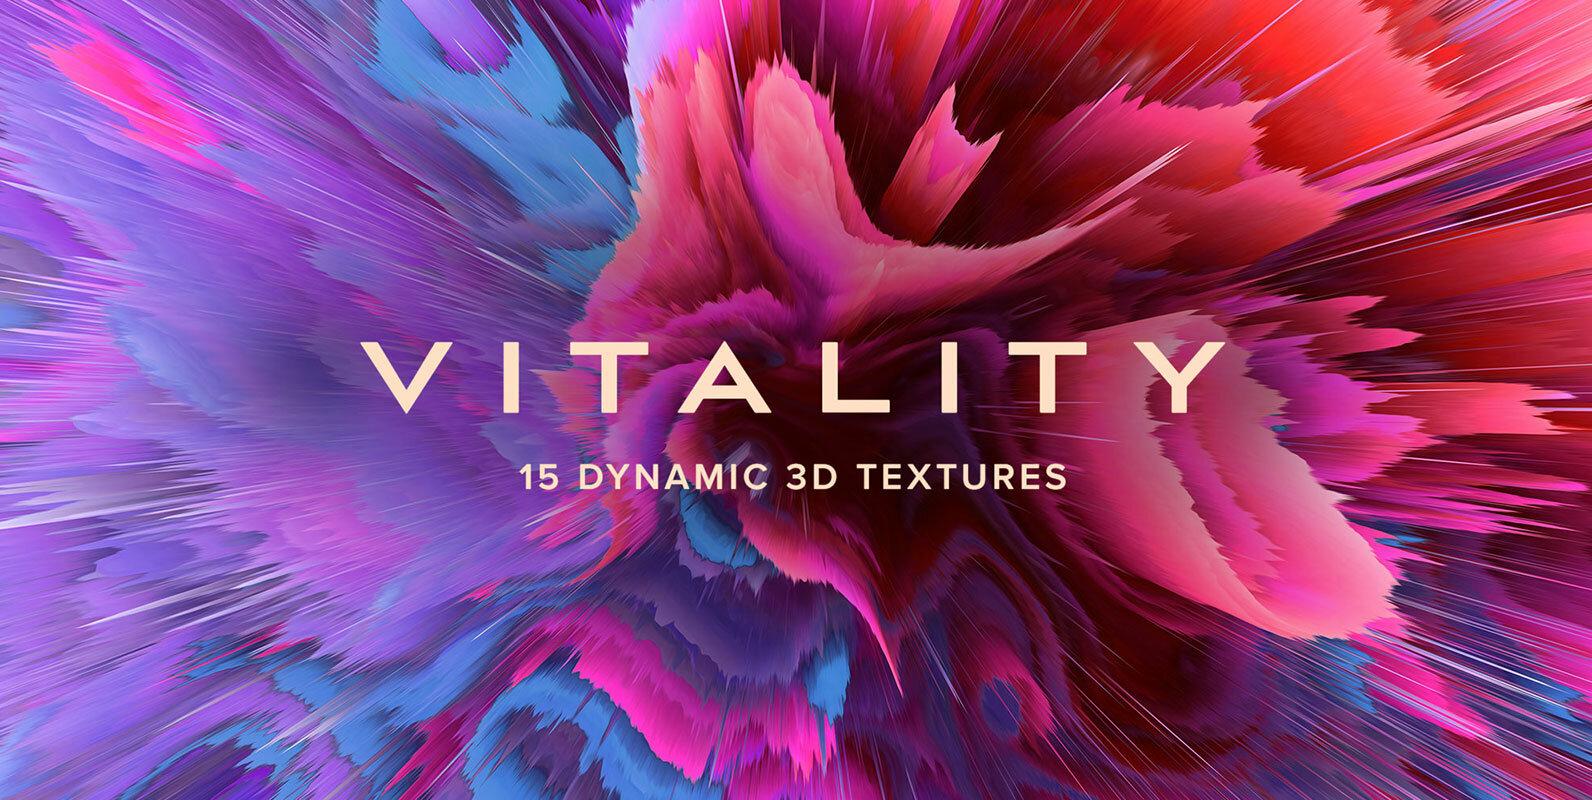 Vitality - 15 Dynamic 3D Textures